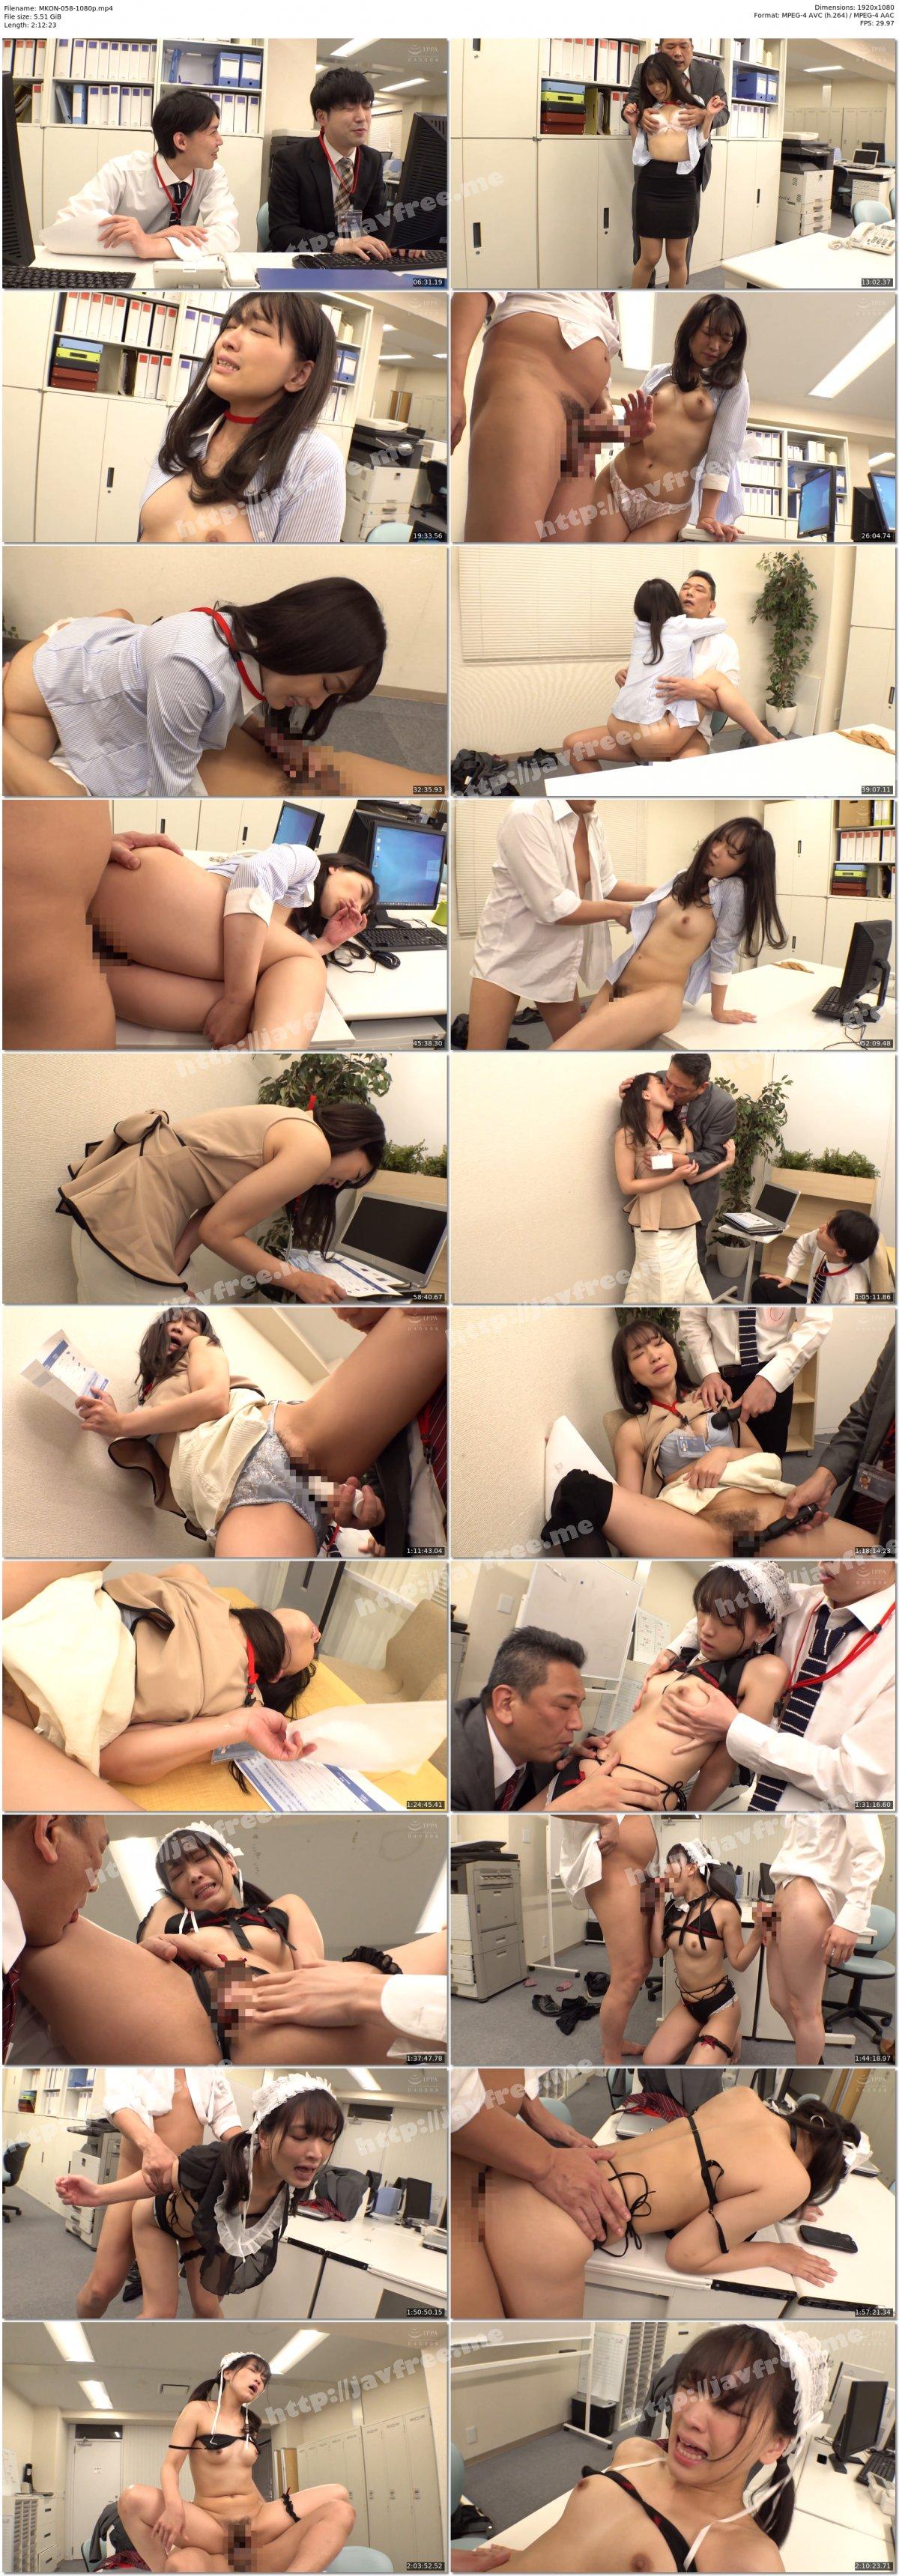 [HD][MKON-058] 愛する彼女がゴリゴリ体育会系のパワハラ上司に寝取られた話 星あめり - image MKON-058-1080p on https://javfree.me